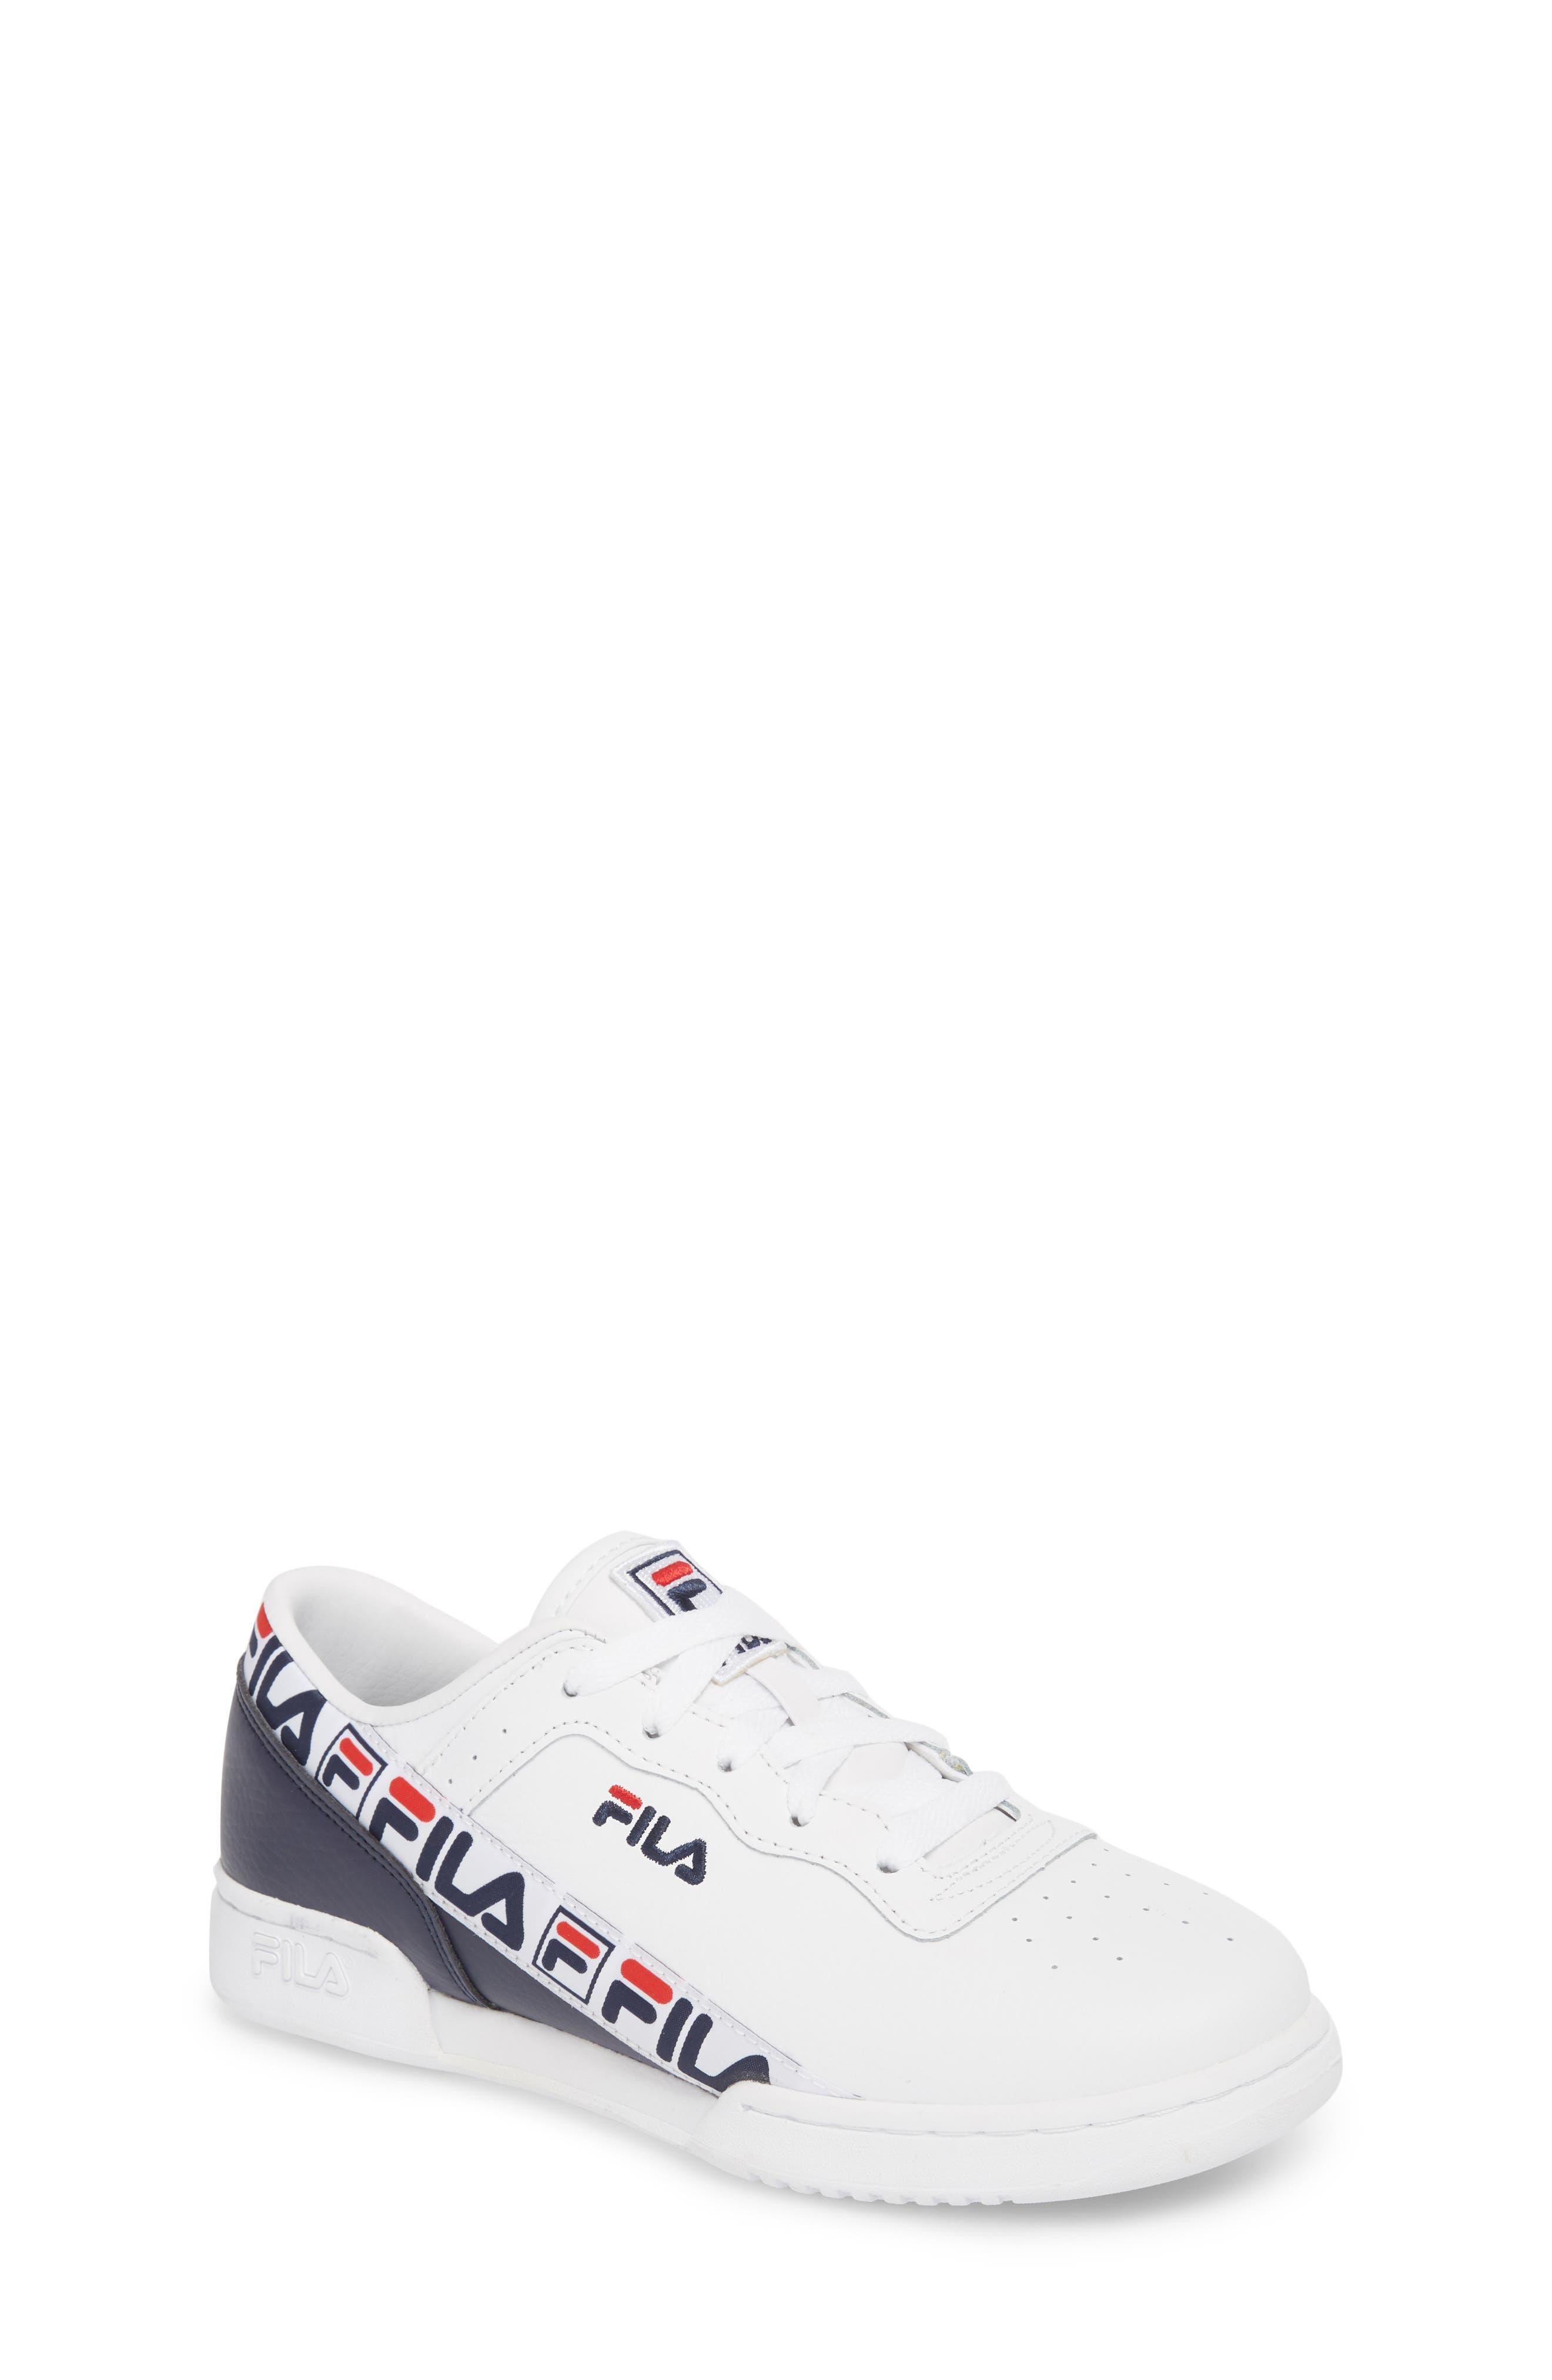 wholesale dealer db413 f3988 Big Boys  FILA Shoes (Sizes 3.5-7)   Nordstrom